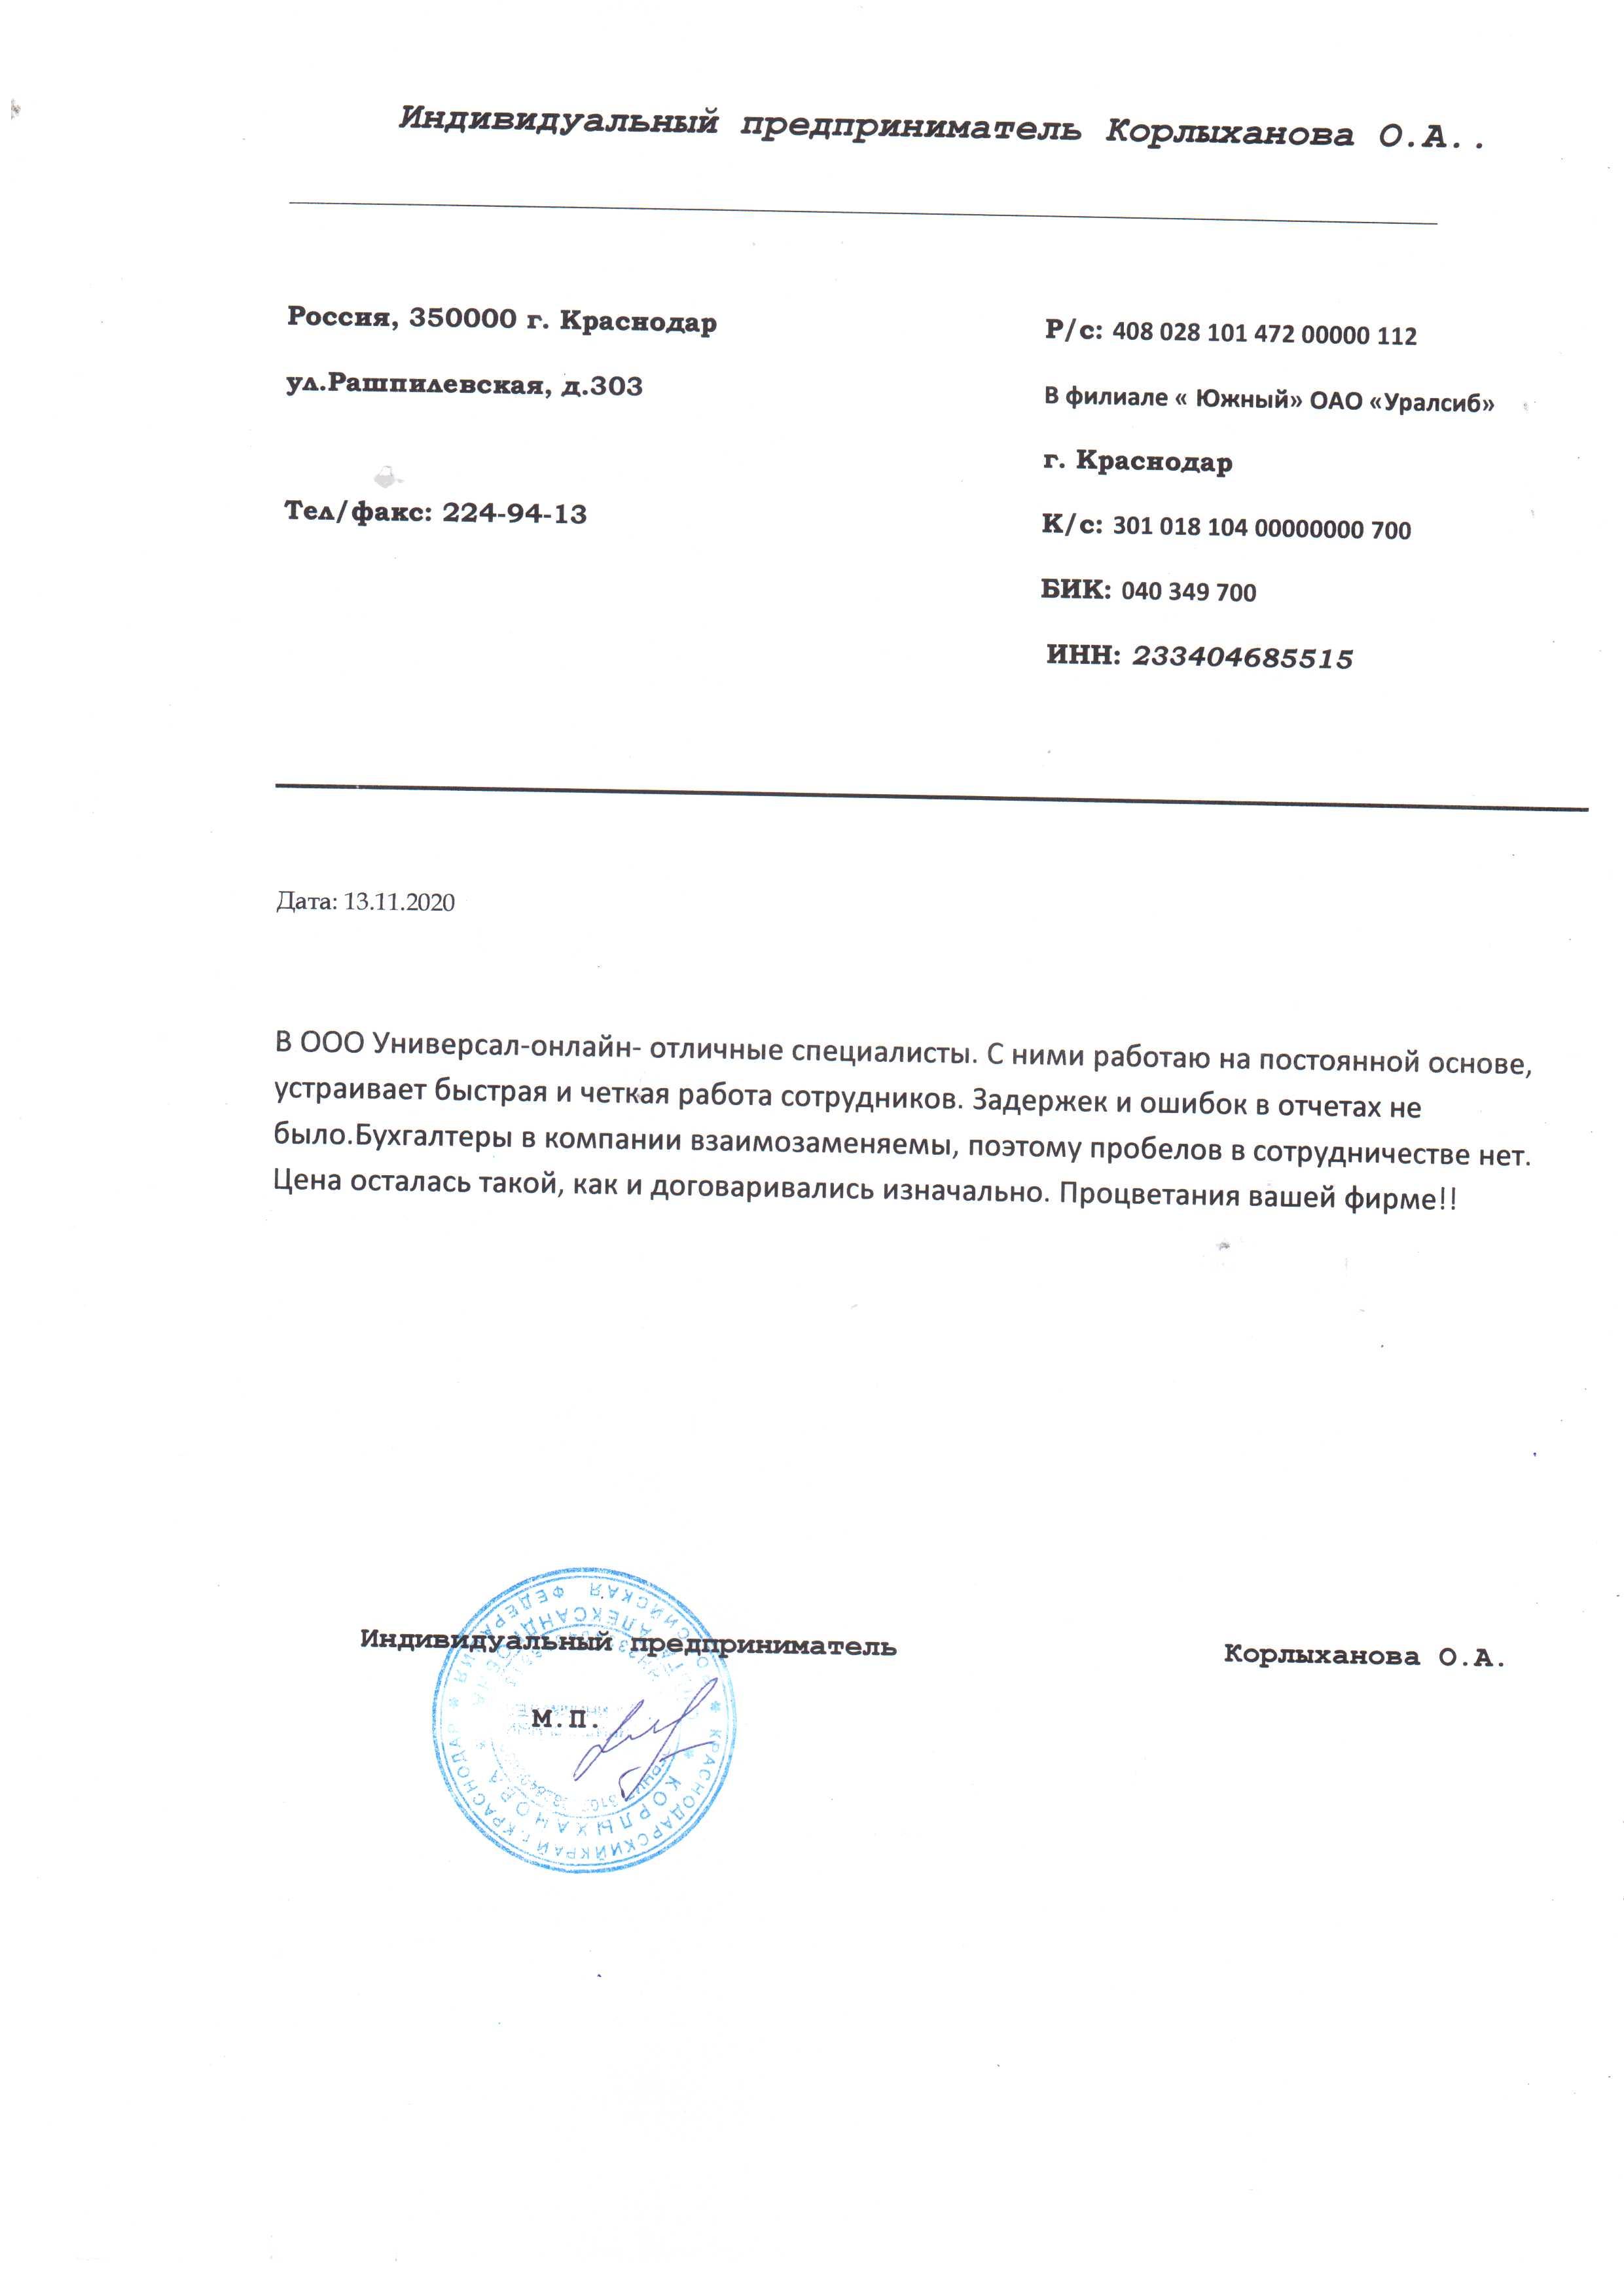 ИП Корлыханова О. А.